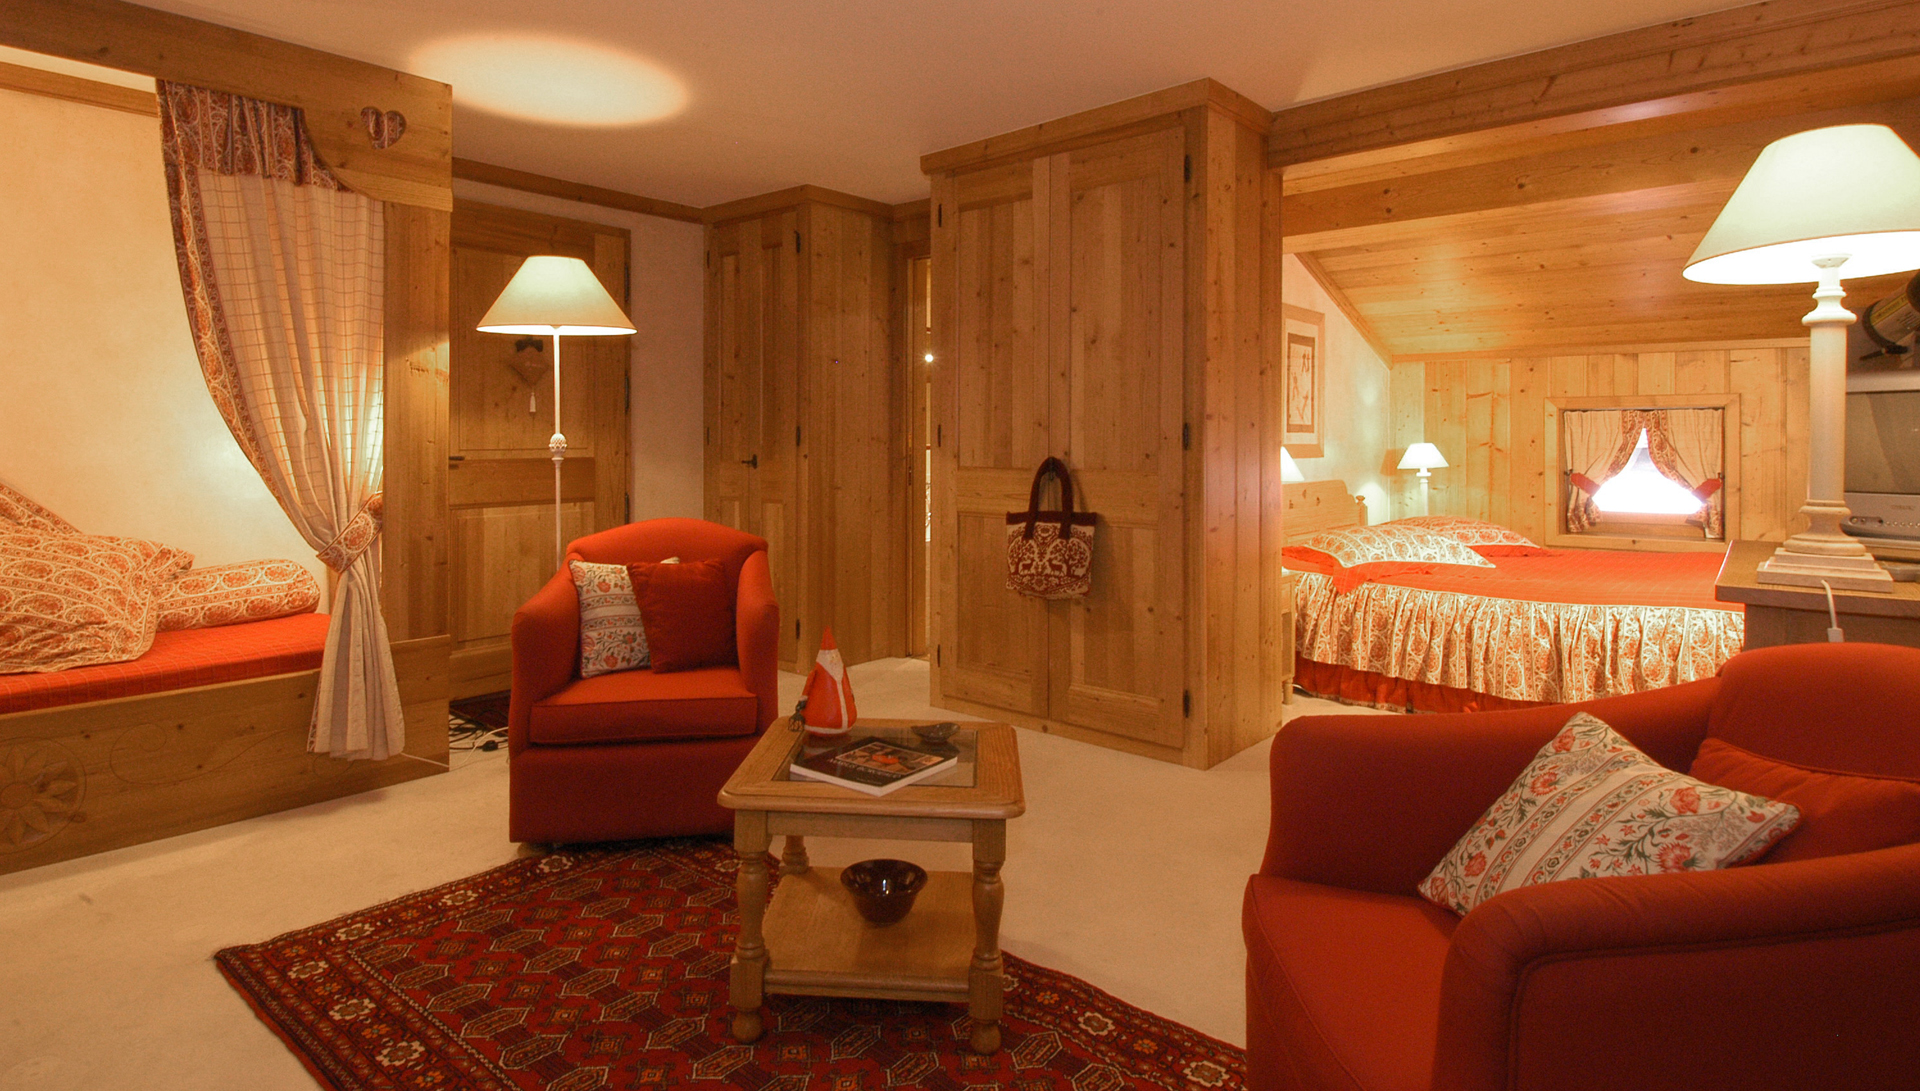 Savoleyres Rooms - Chalet d'Adrien